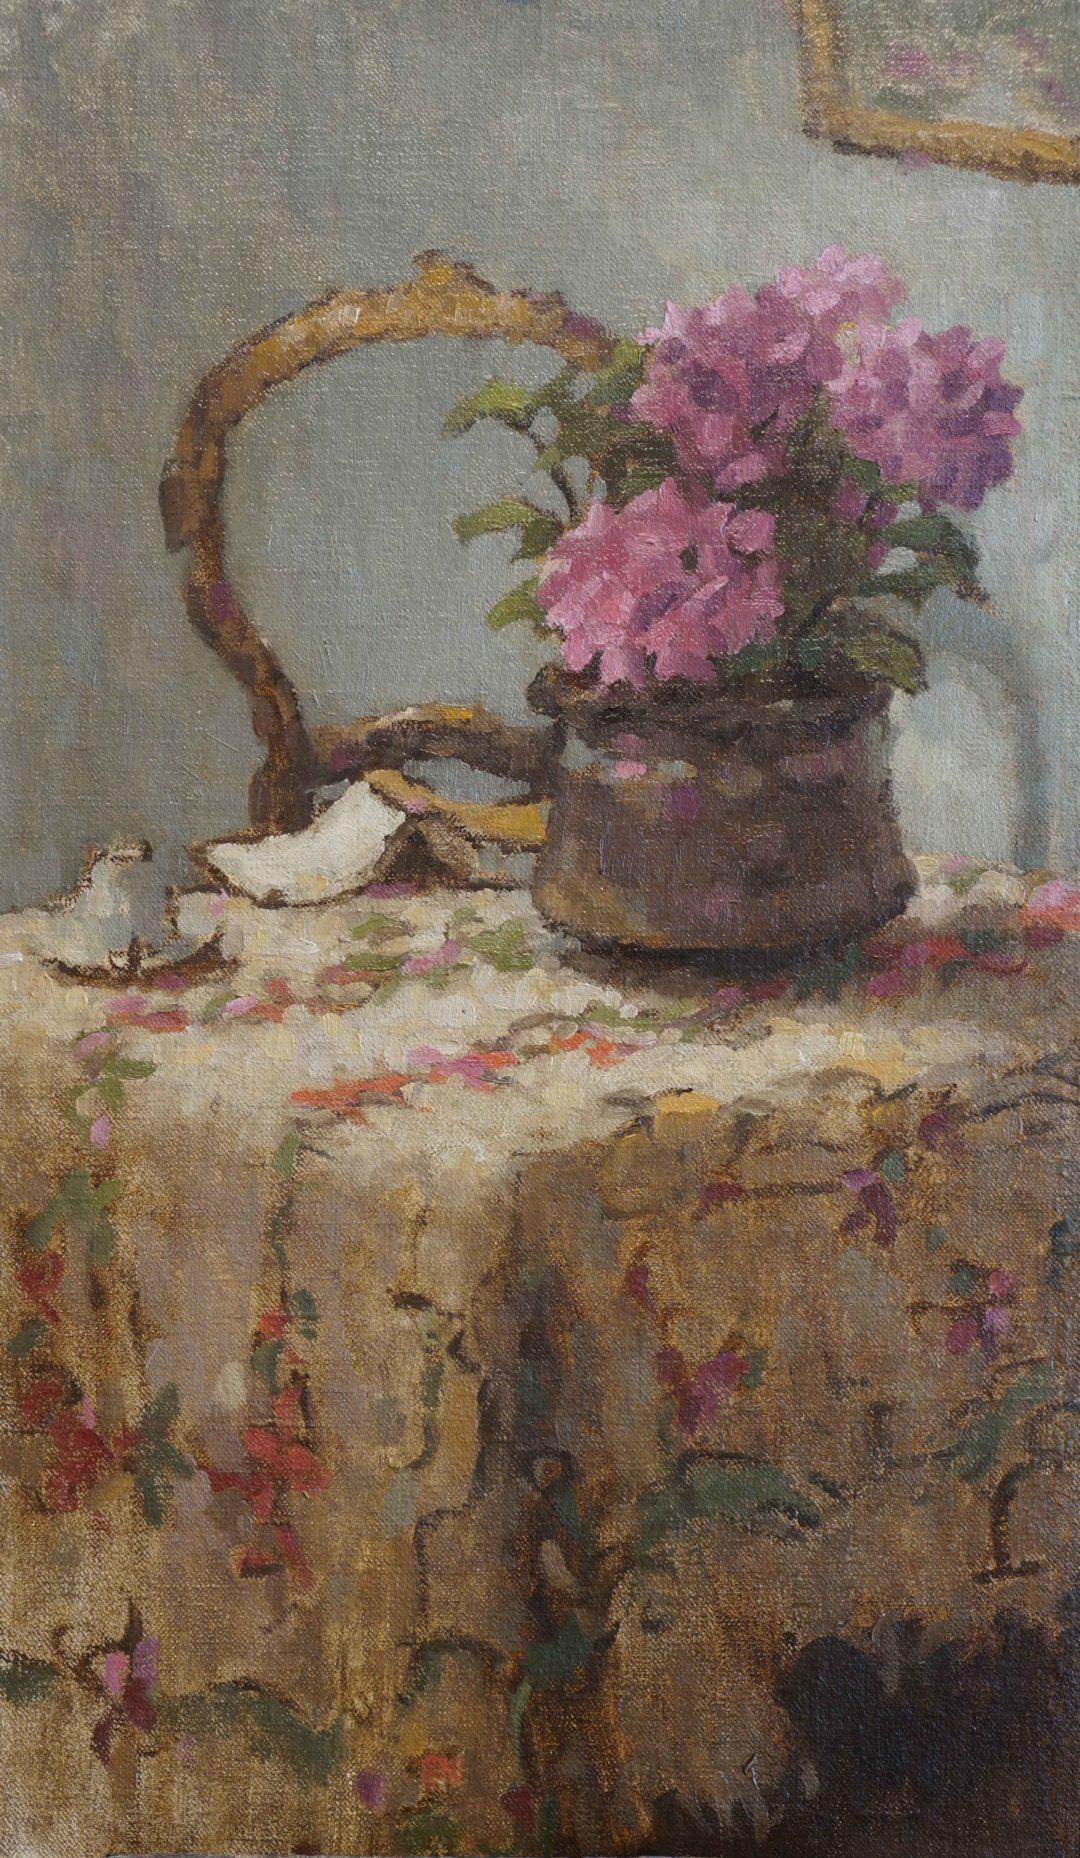 Stillife on my Italian tablecloth